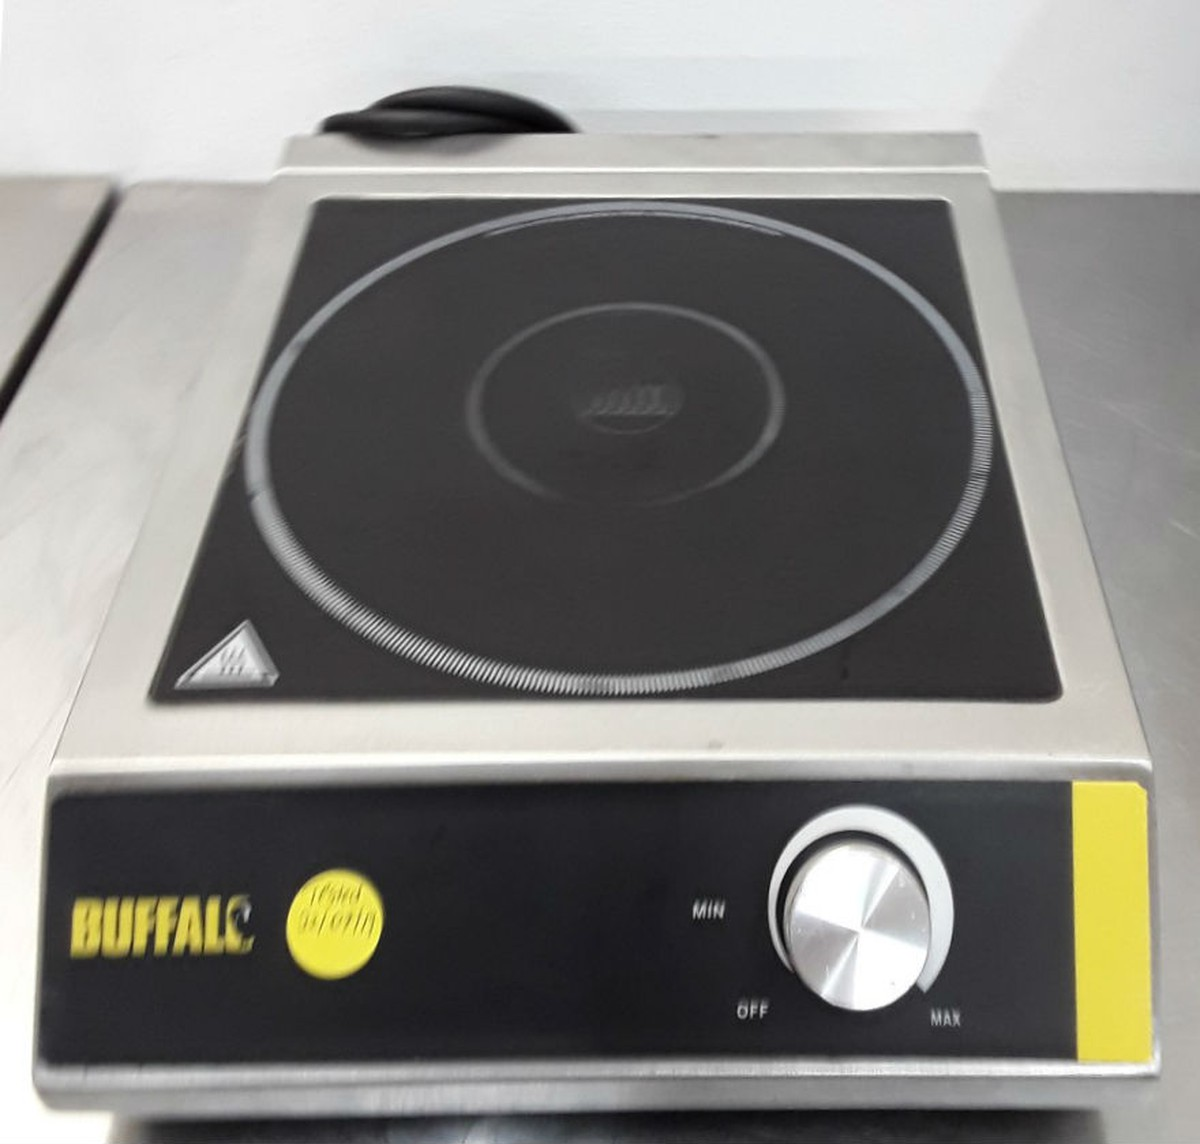 3 kW Power Buffalo CE208 Buffalo Induction Hob